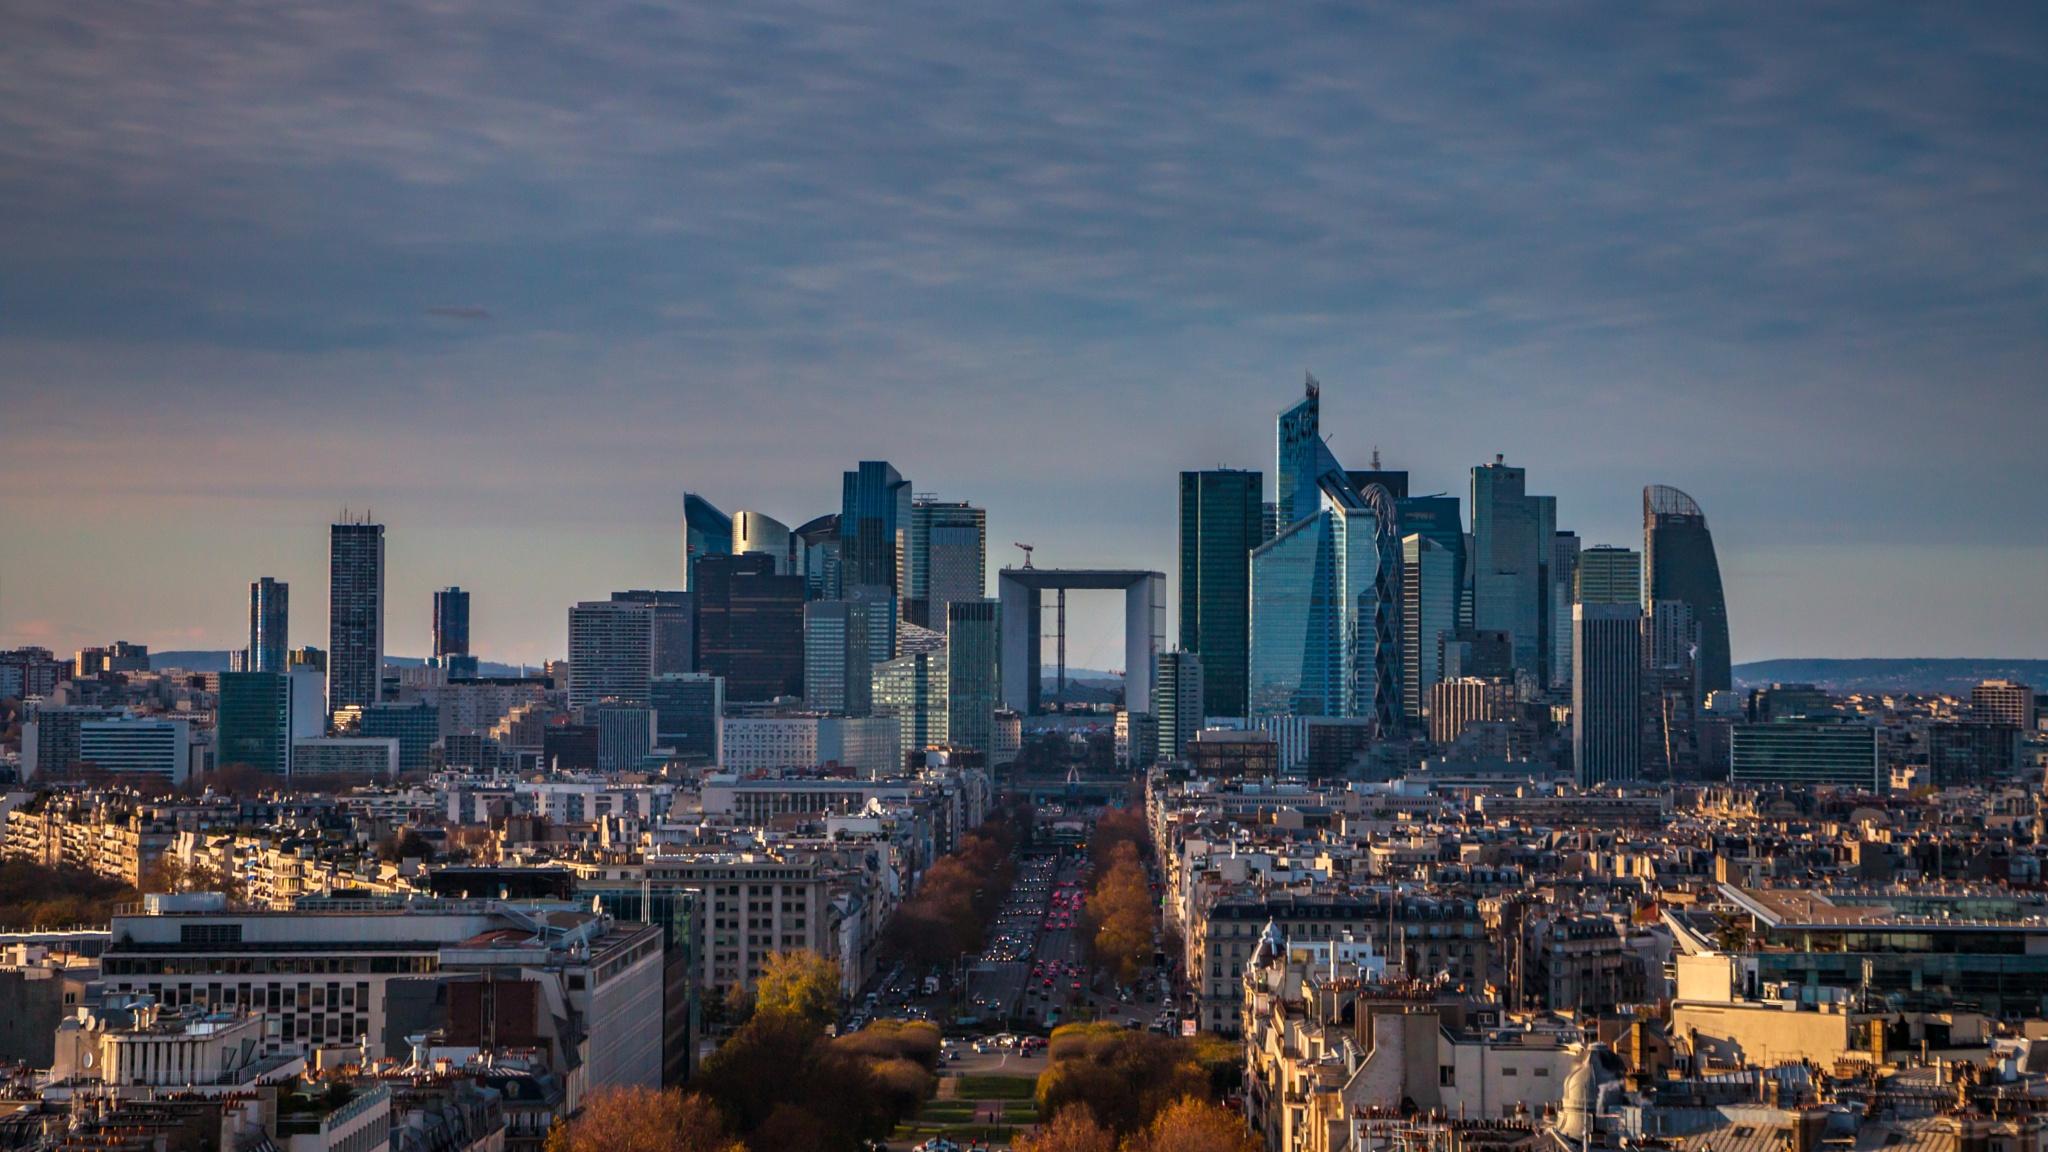 Paris La Défense skyline by djaffar adane